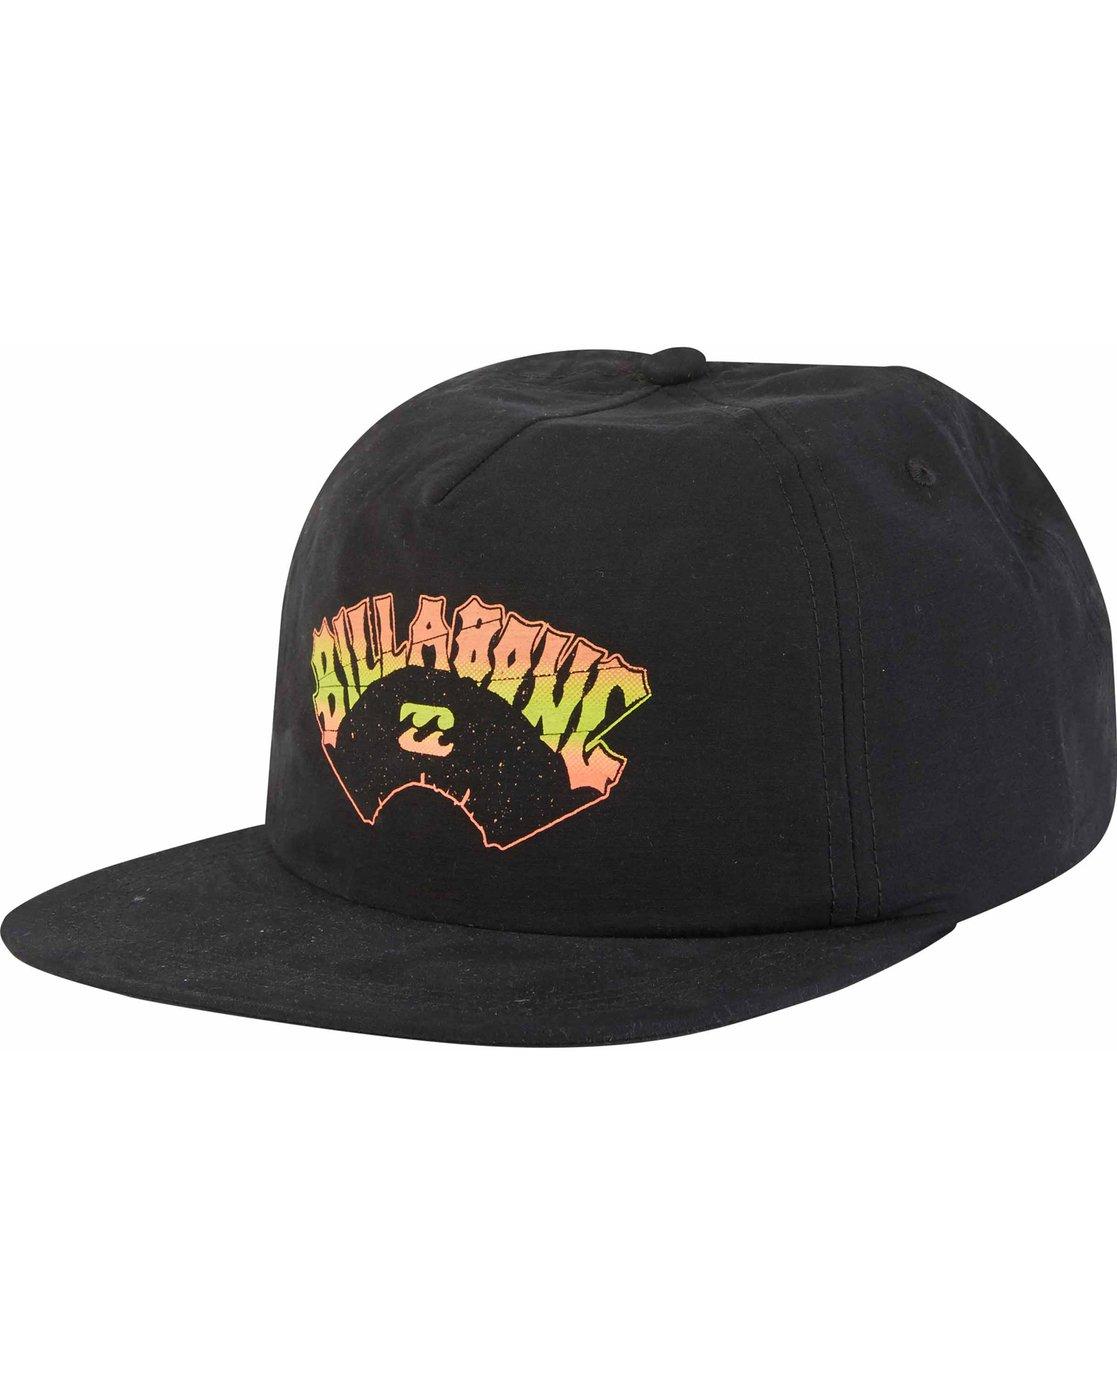 Re-issue Re-issue Snapback Hat Snapback Re-issue Hat Snapback